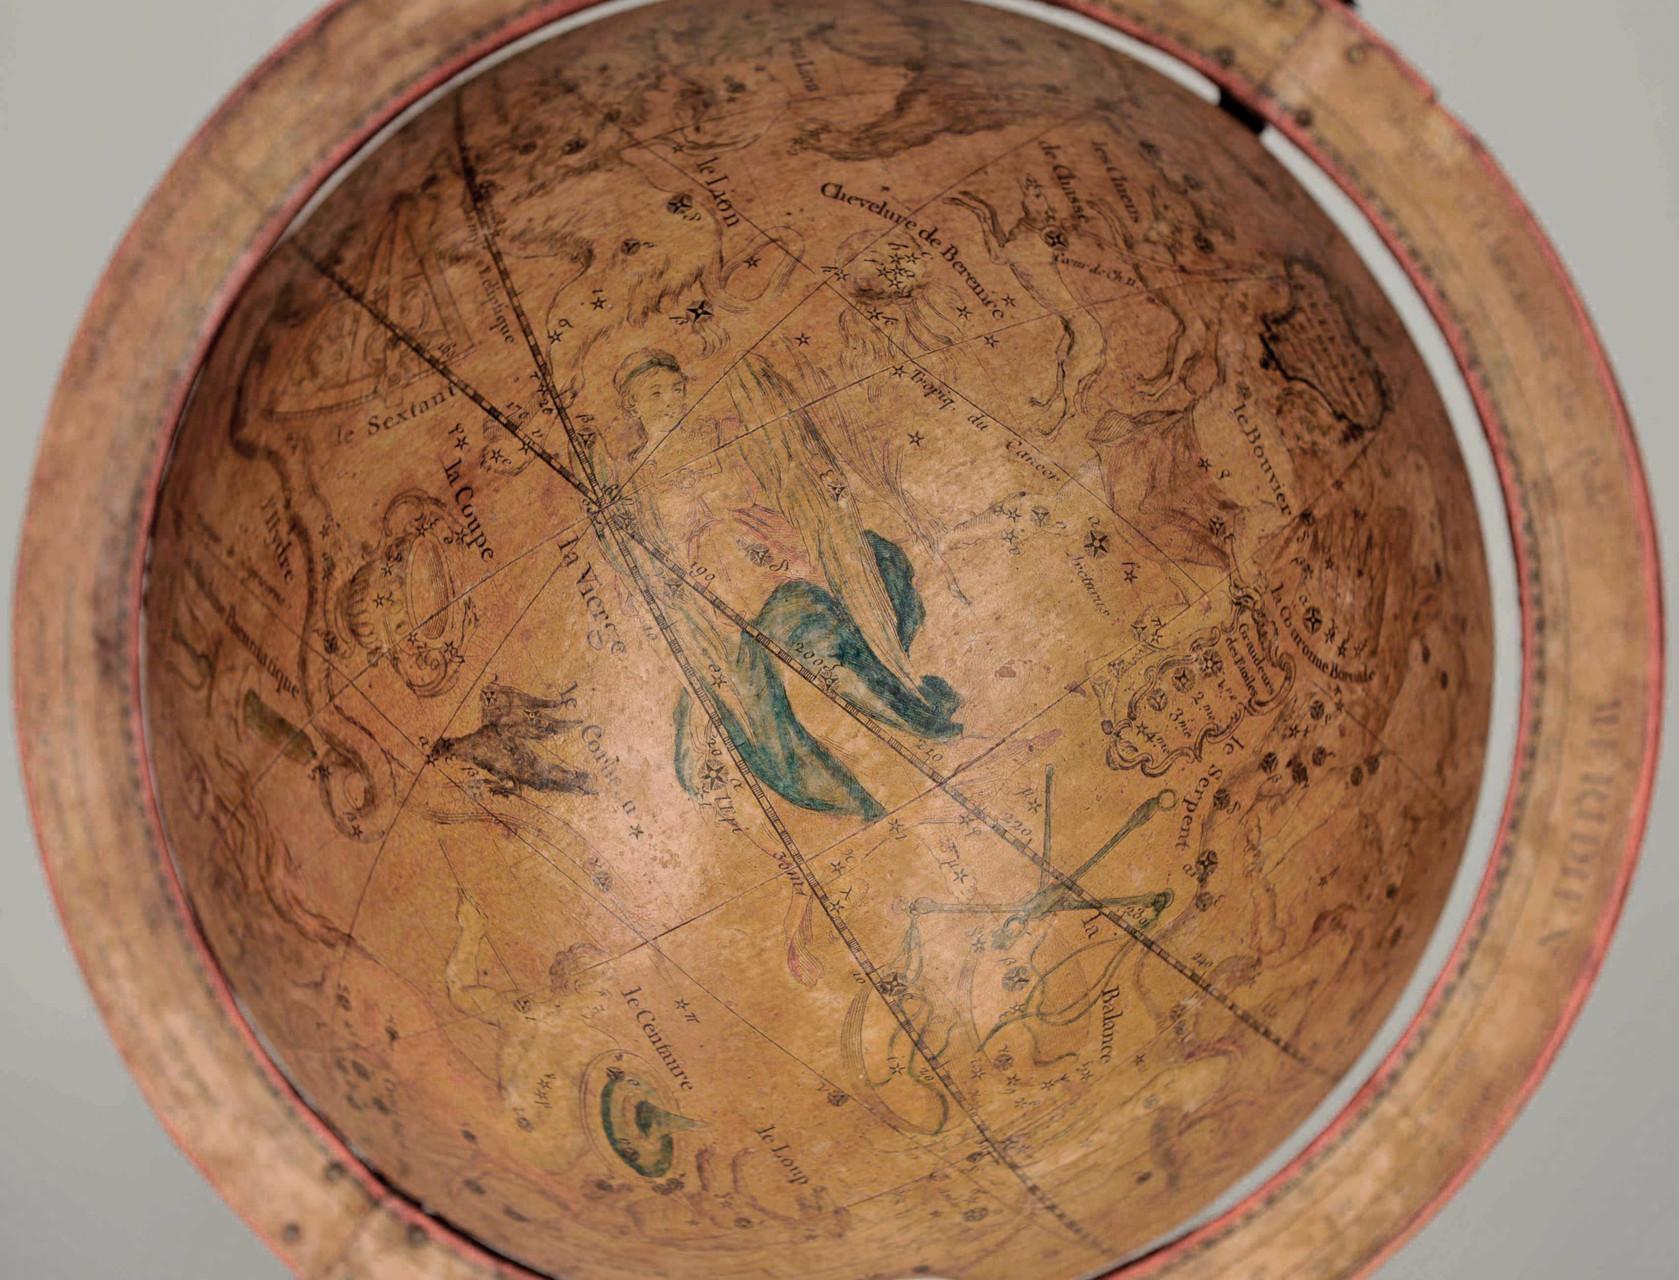 dettaglio globo celeste dopo